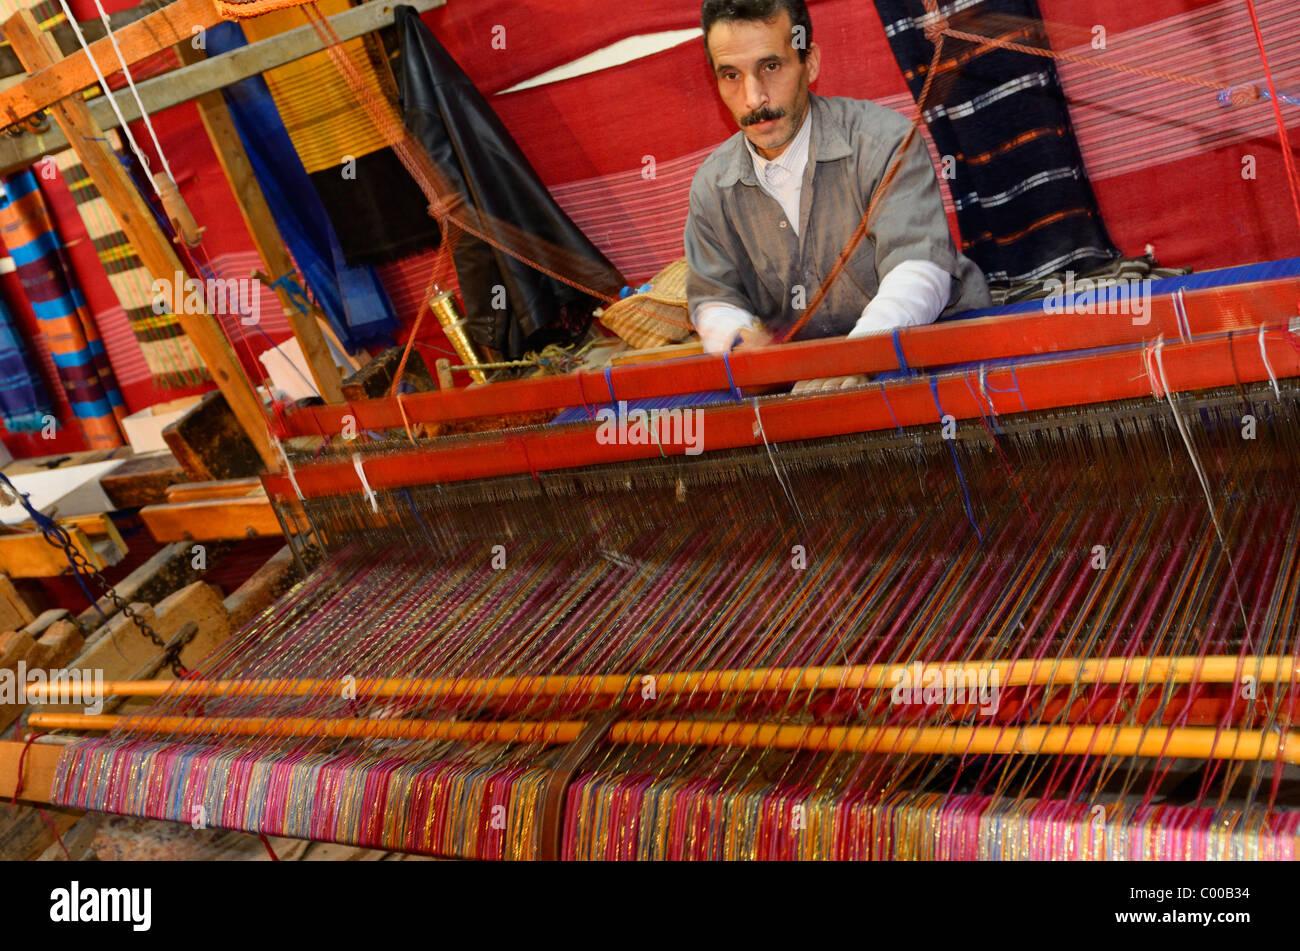 Weaver operating a horizontal wooden hand loom in a cloth shop Fes el Bali Medina Fez Morocco - Stock Image